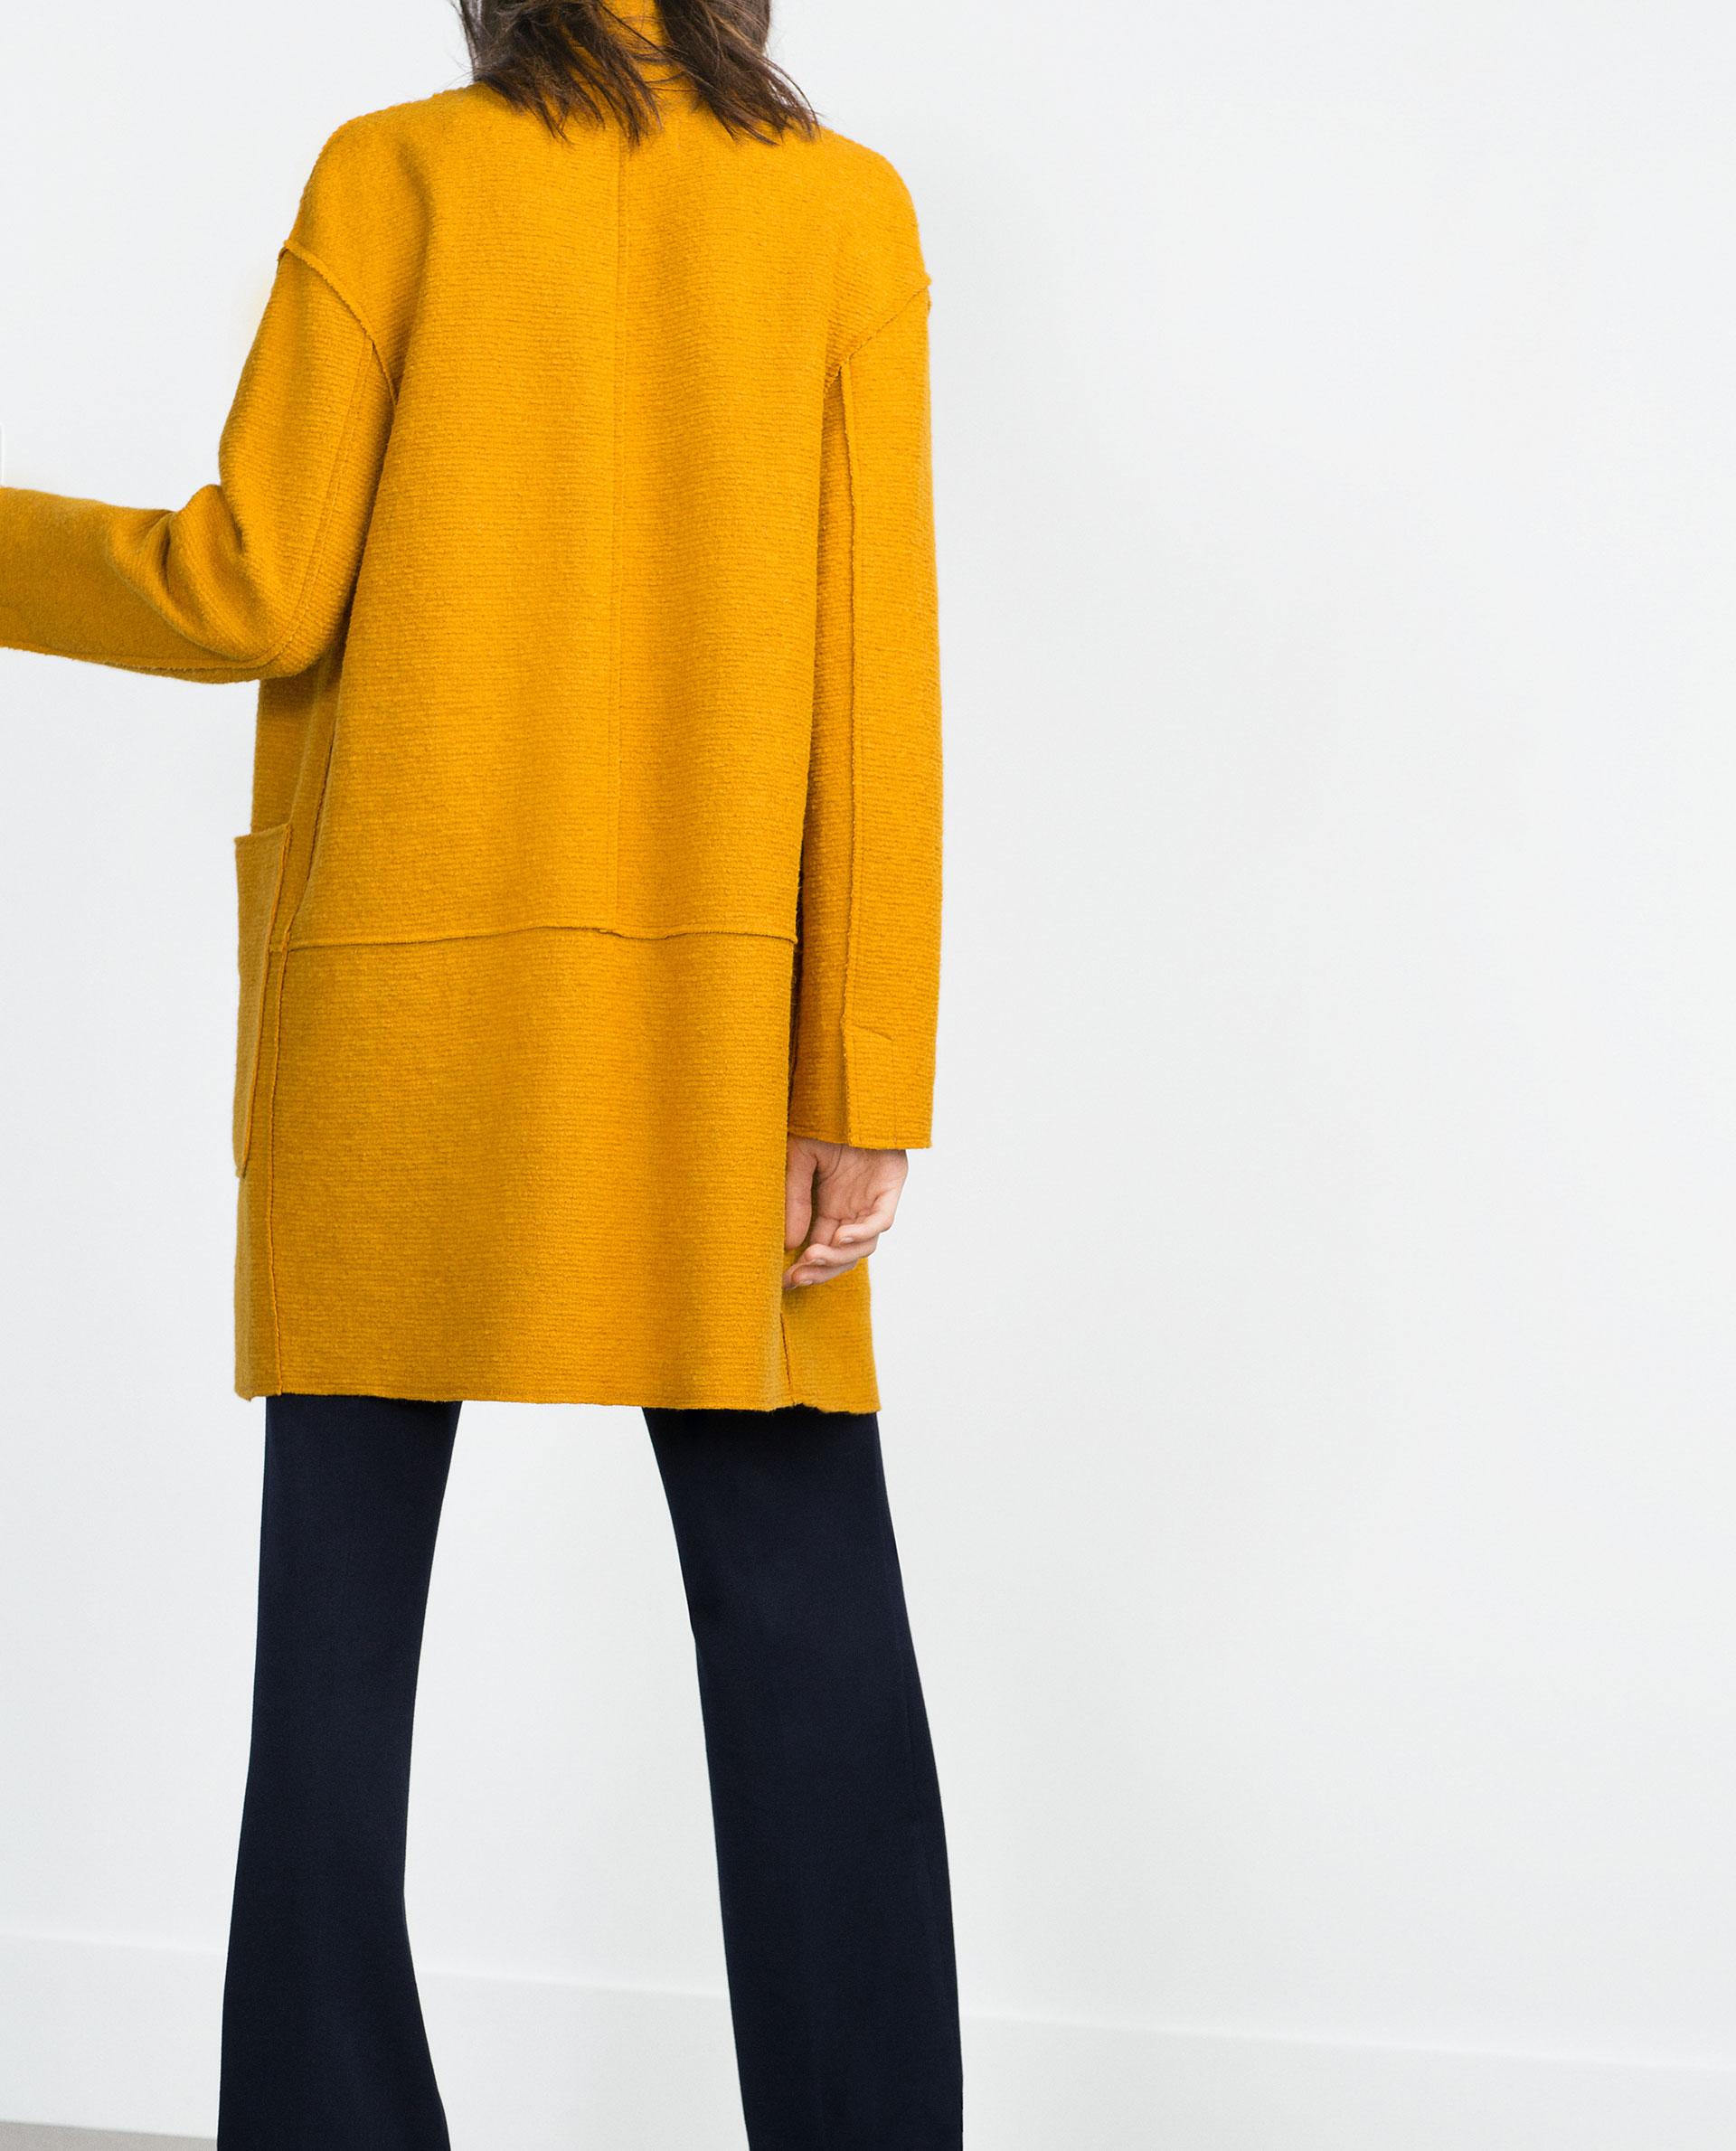 Zara Lana Abrigos Mujer Mujer Lana Zara Abrigos Zara rqrw48